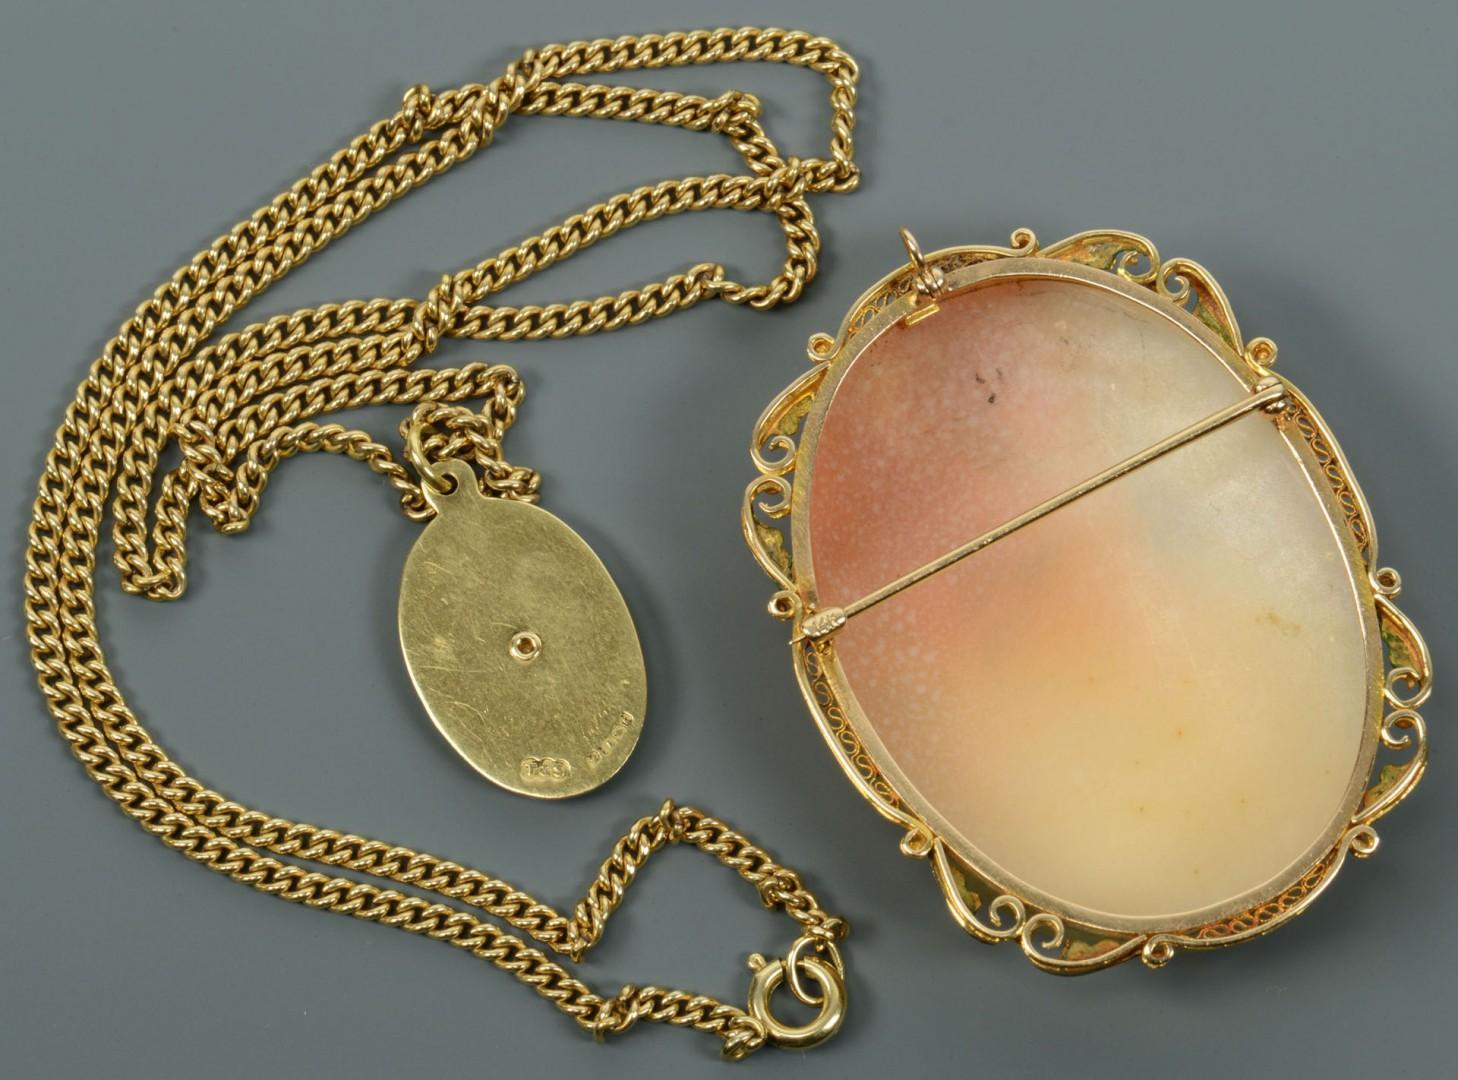 18k London pendant and GF Cameo